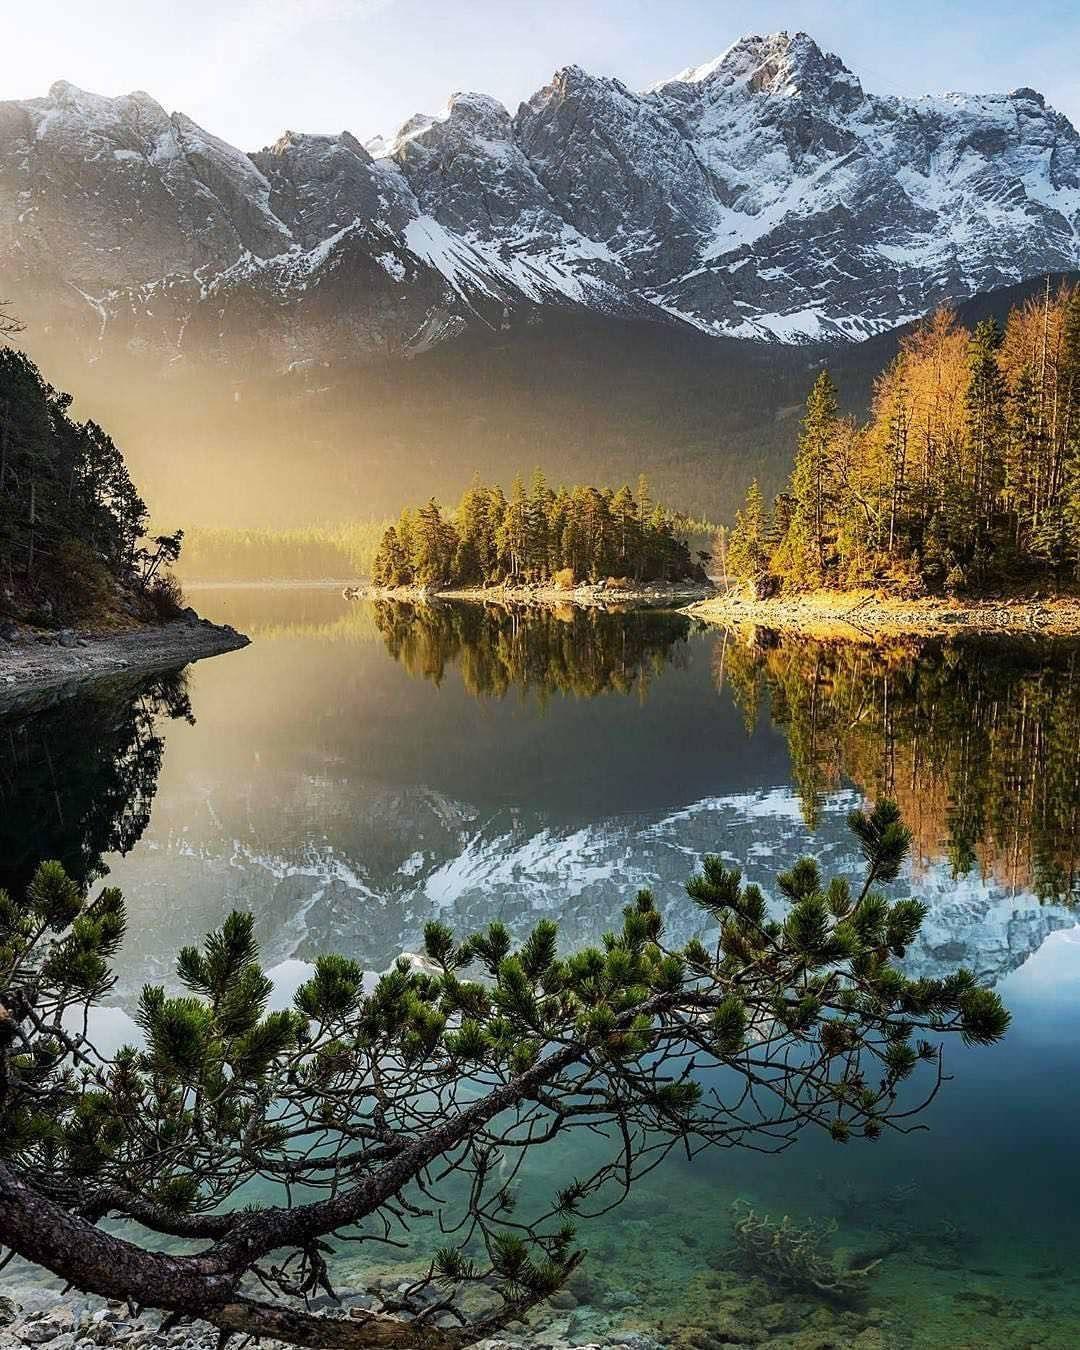 Eibsee Lake Bayern Germany Beautiful Nature Nature